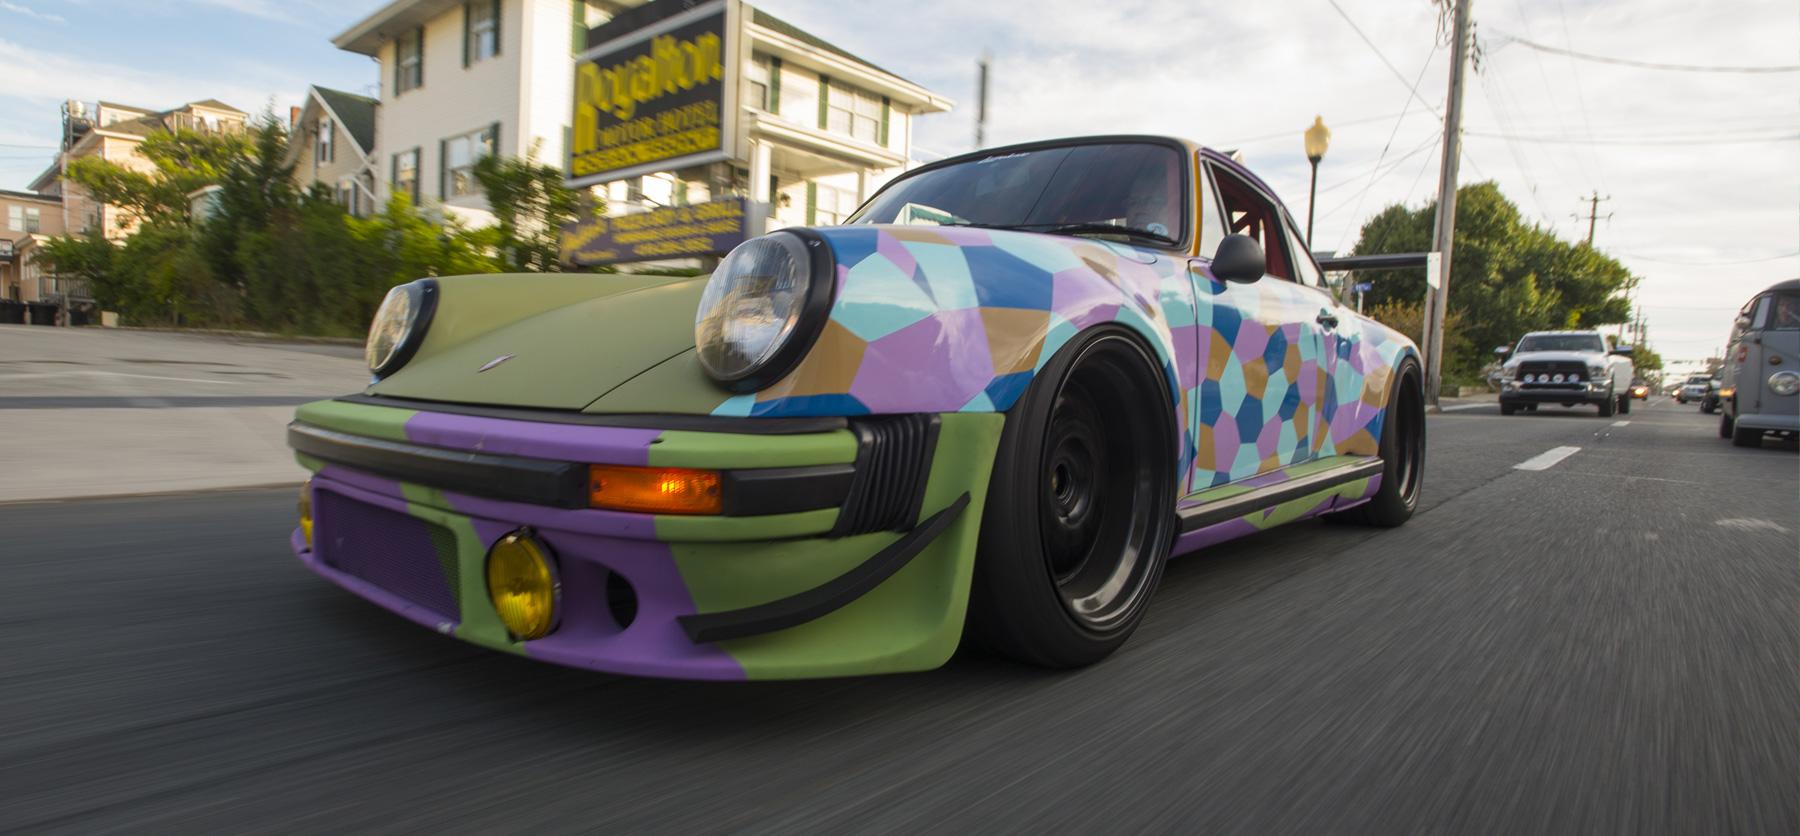 A picture of projectstuka Porsche 911 driving